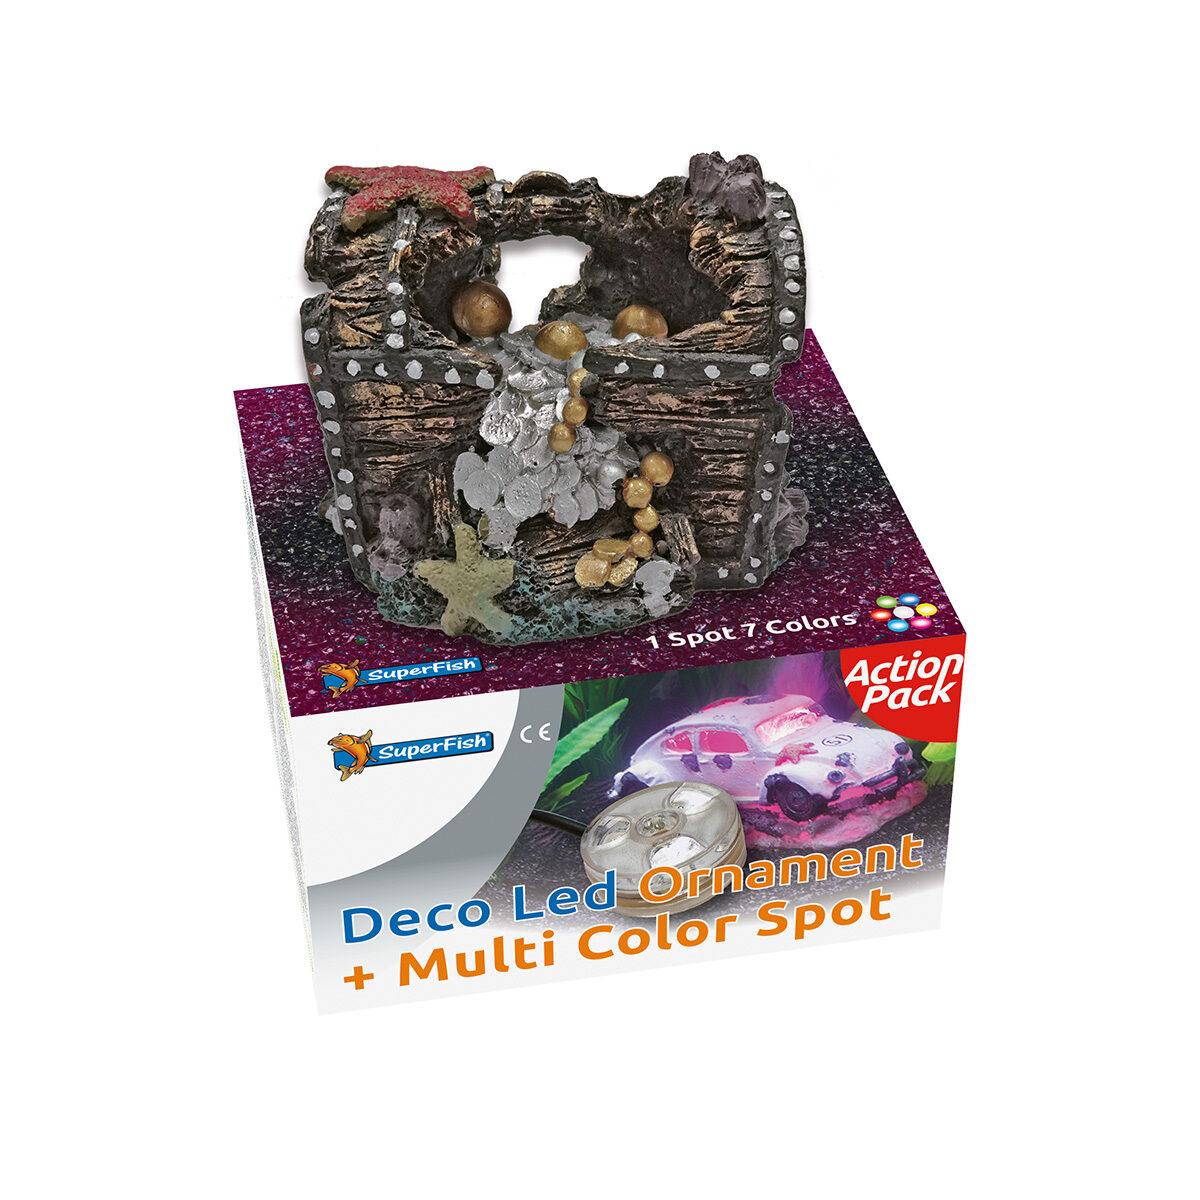 SuperFish Deco LED Ornament met Multi Color Spot Schatkist - in Decoratie